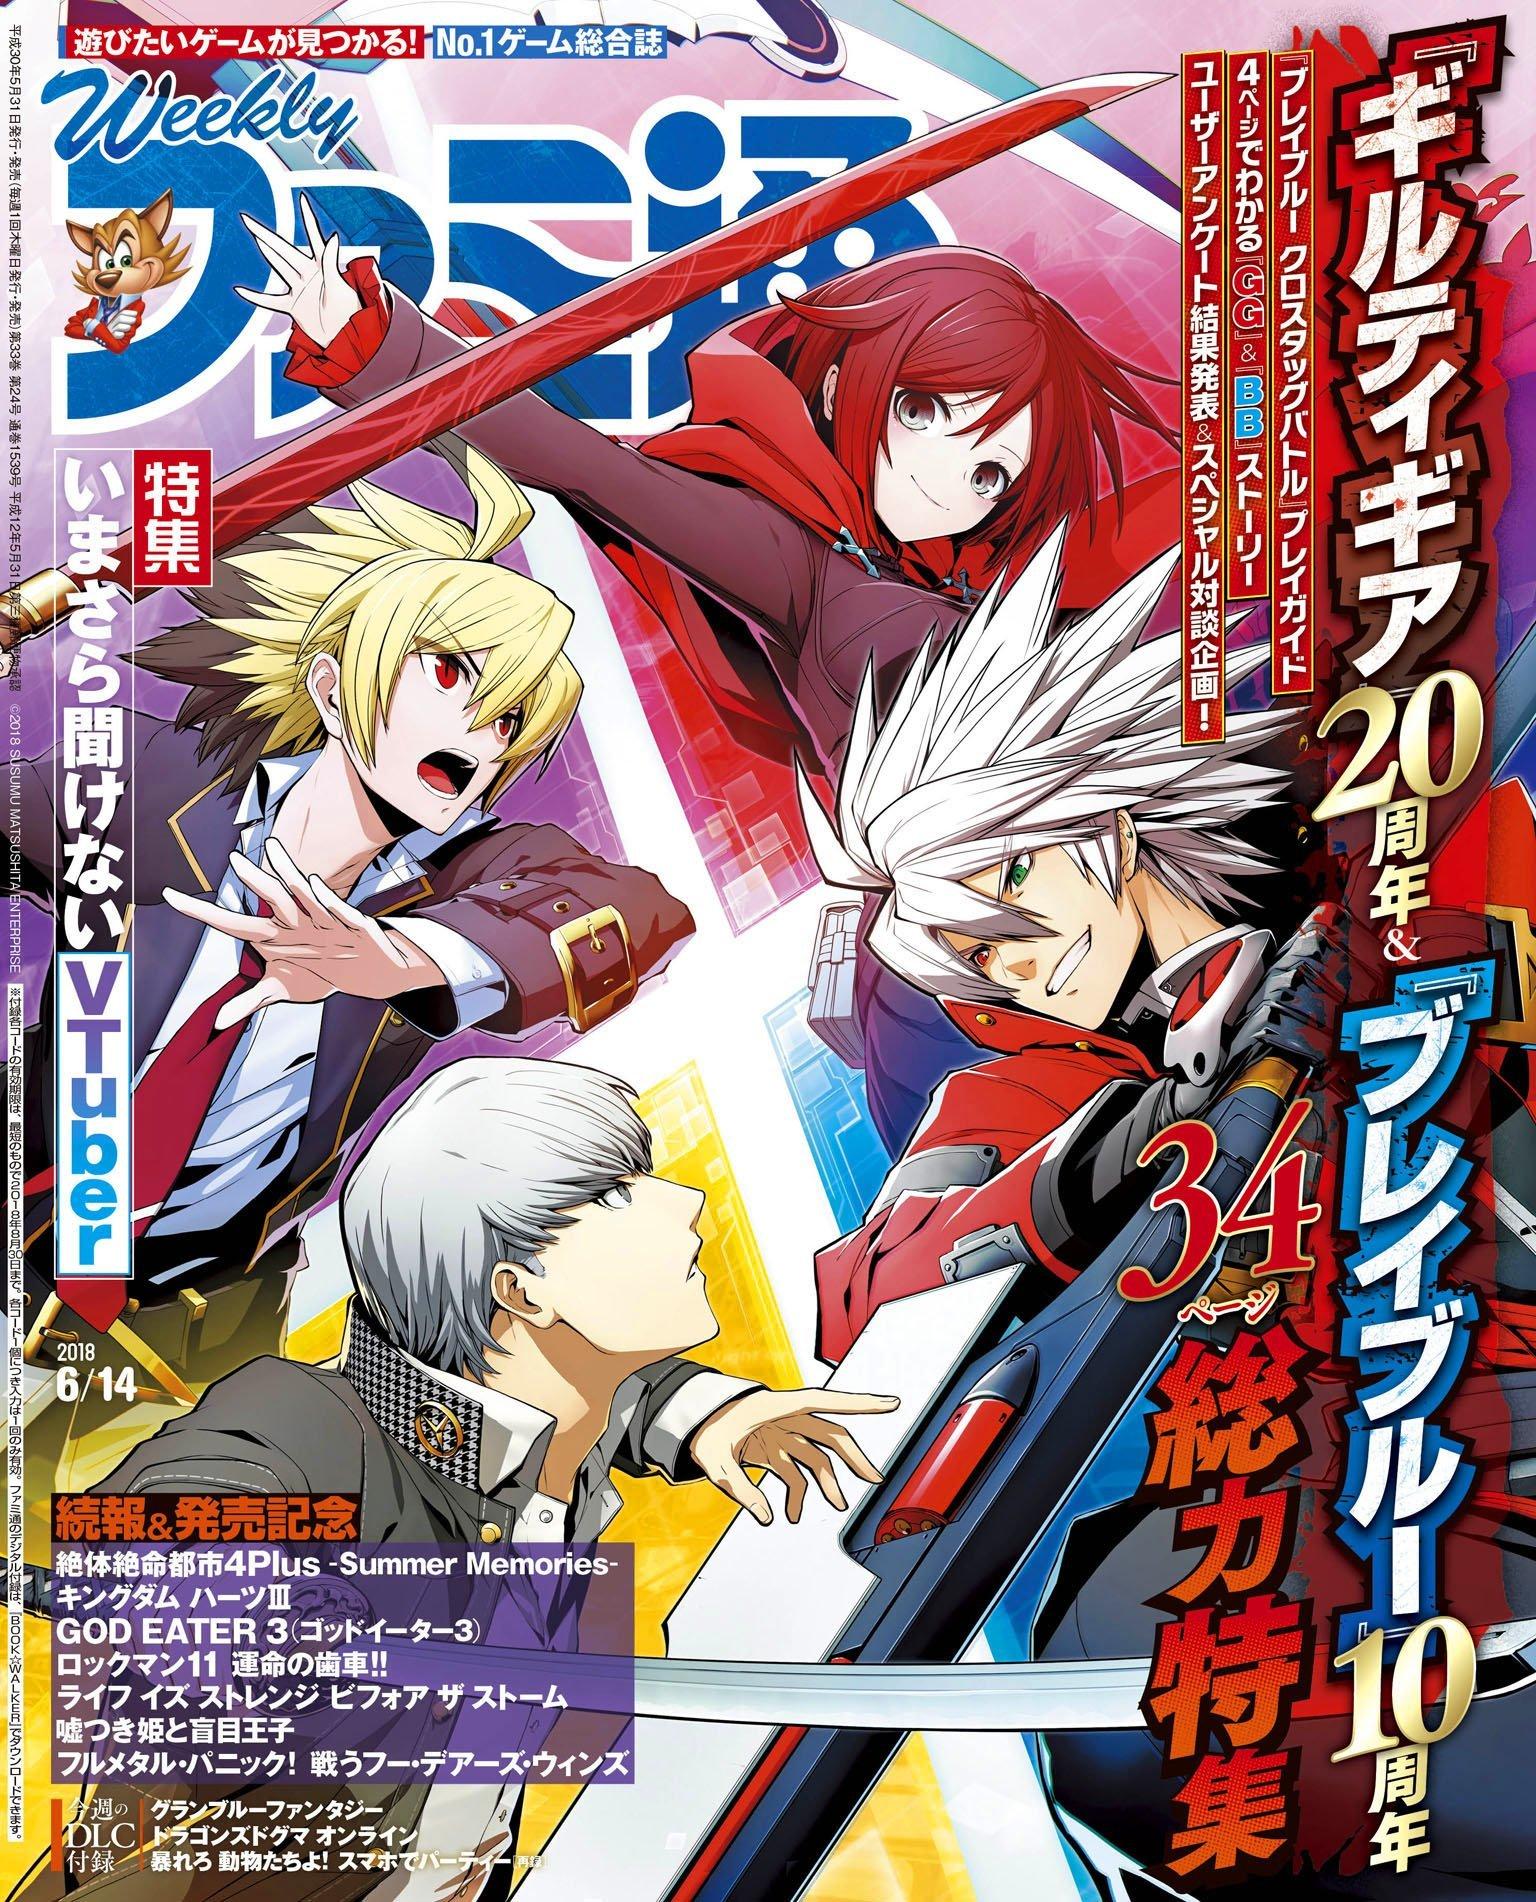 Famitsu 1539 (June 14, 2018)